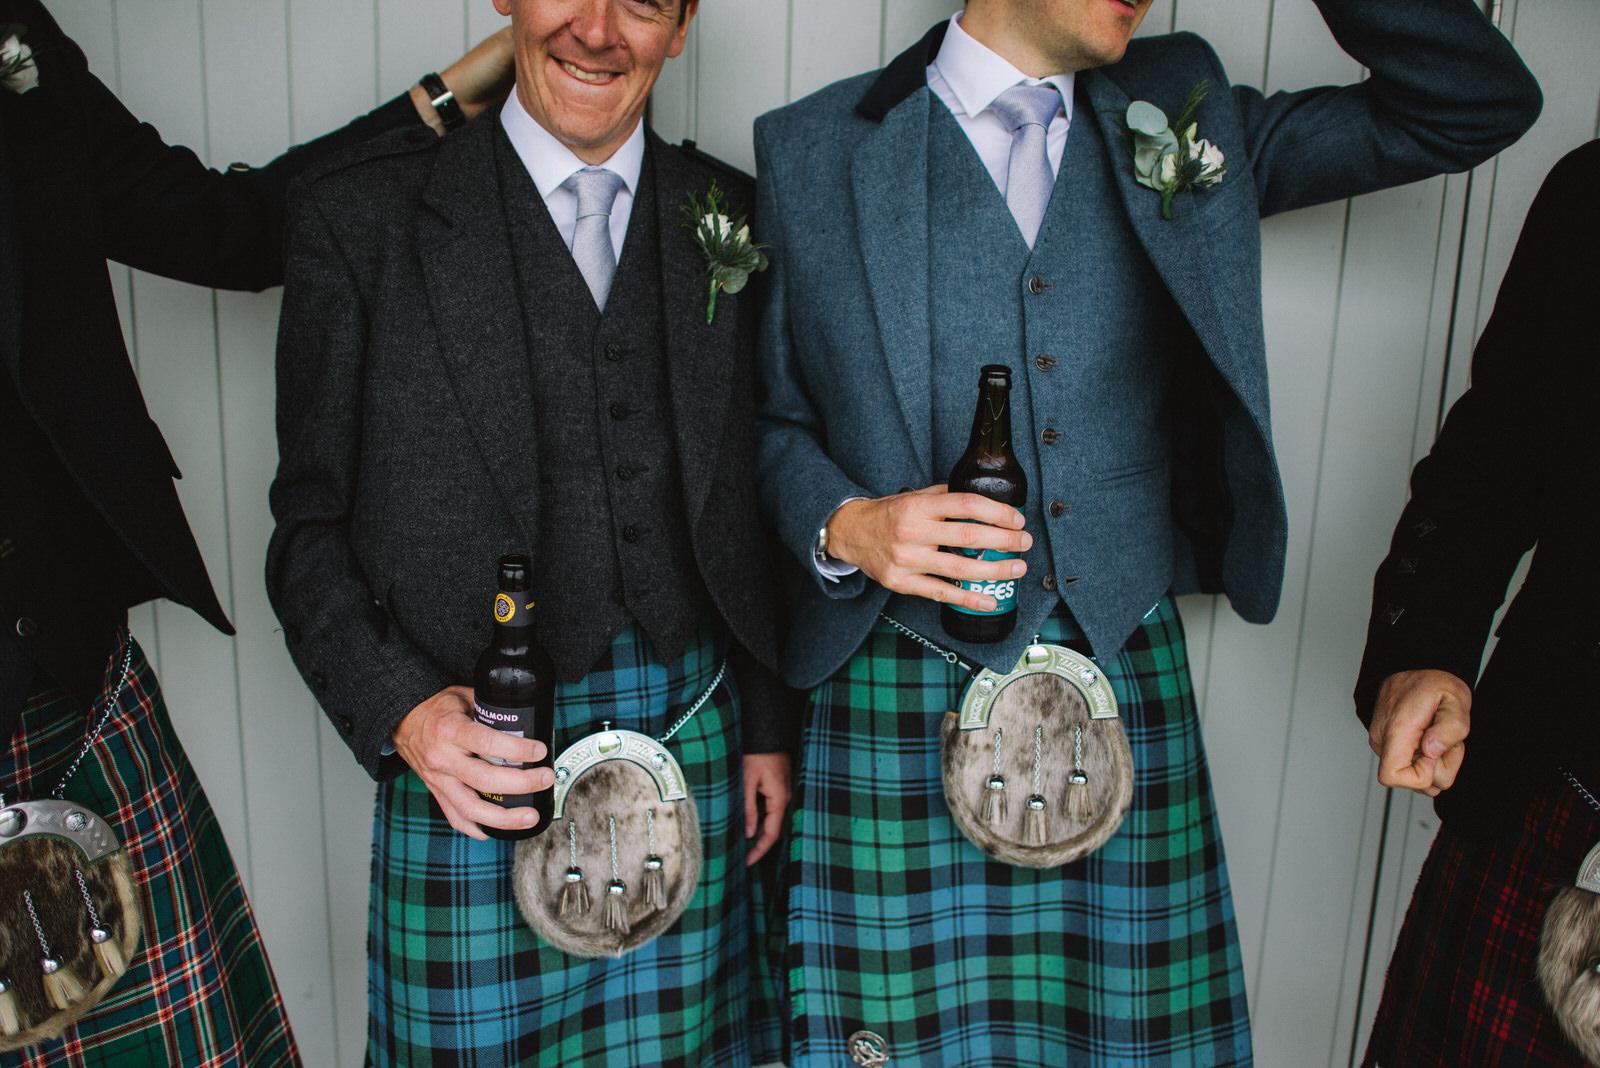 013-GUARDSWELL-FARM-WEDDING-ALTERNATIVE-SCOTTISH-WEDDING-PHOTOGRAPHER-SCOTTISH-WEDDING-DESTINATION-WEDDING-PHOTOGRAPHER.JPG